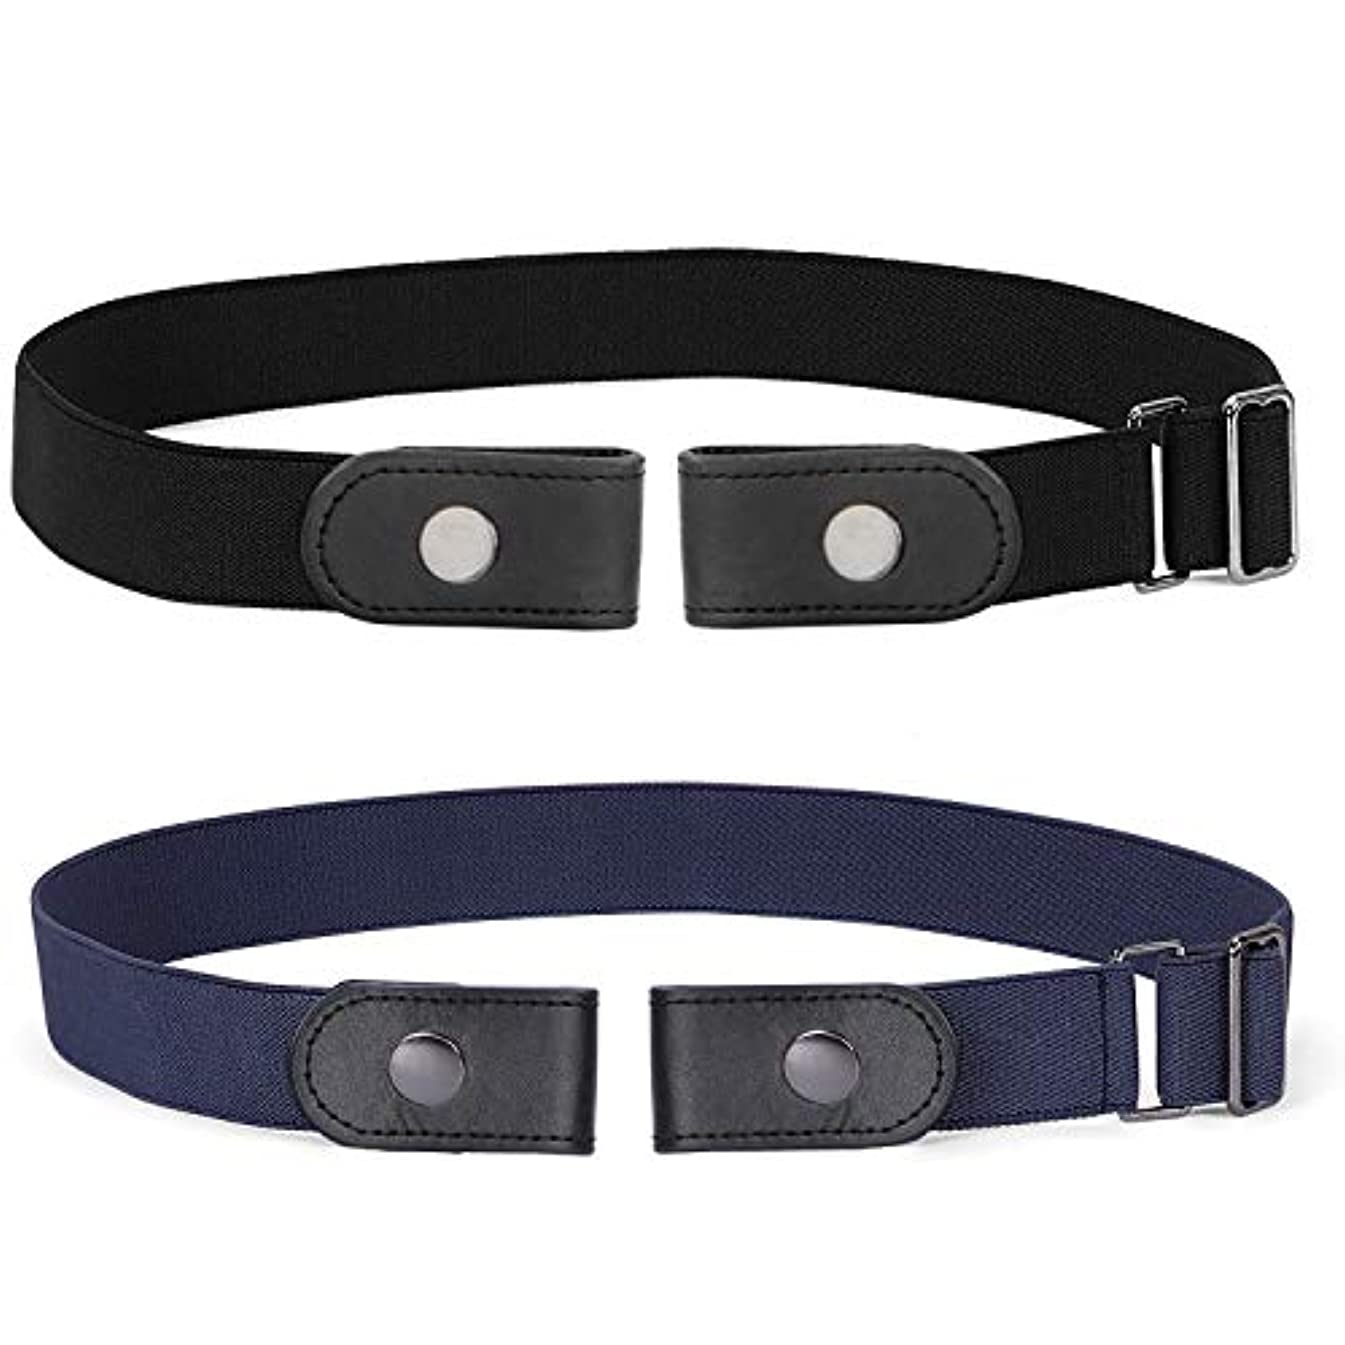 No Buckle Invisible Elastic Belt for Men/Women, SANSTHS Women Jeans Belt Free Buckle